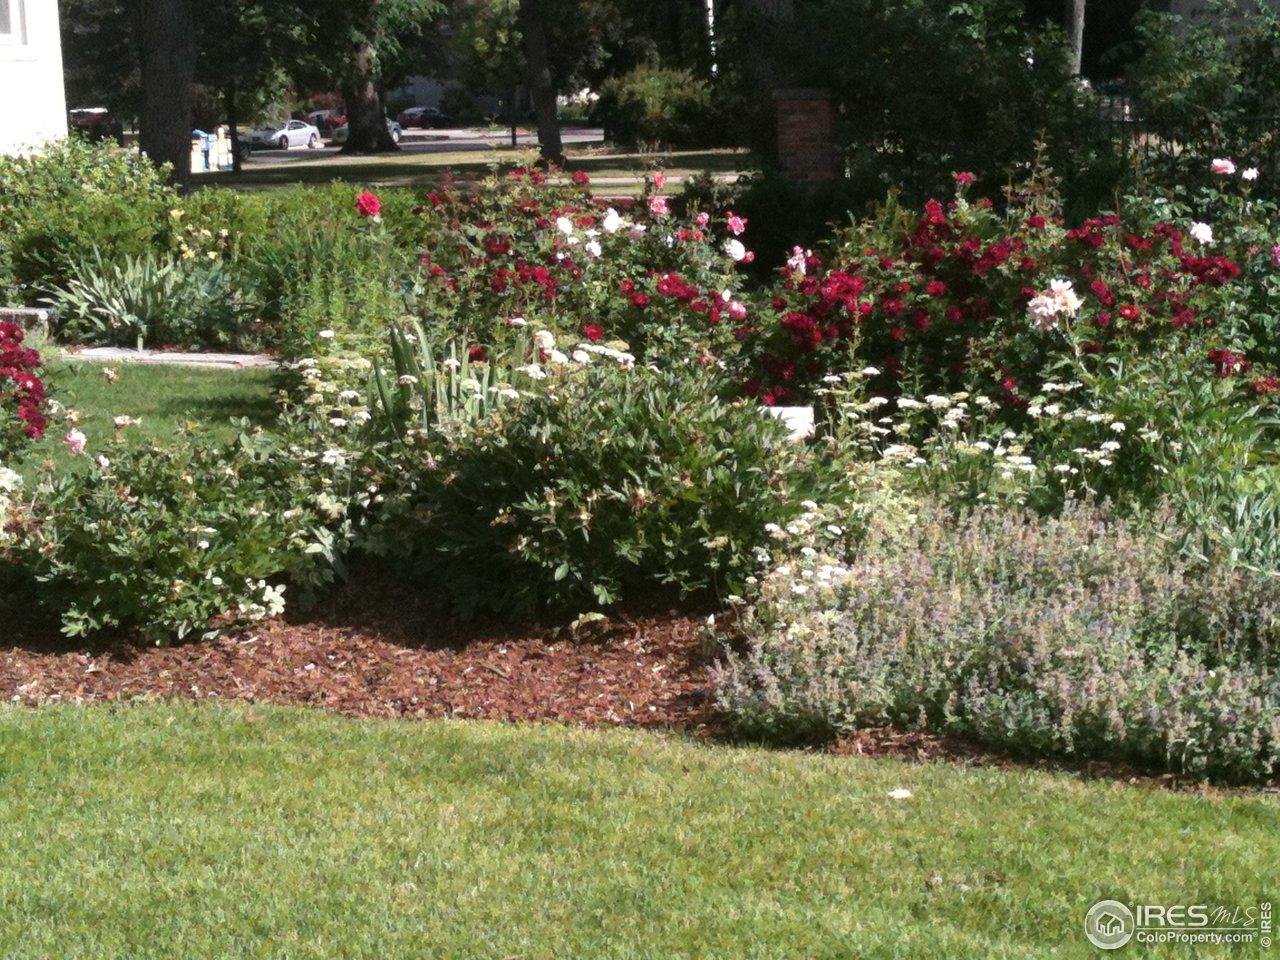 Historic Rose Garden